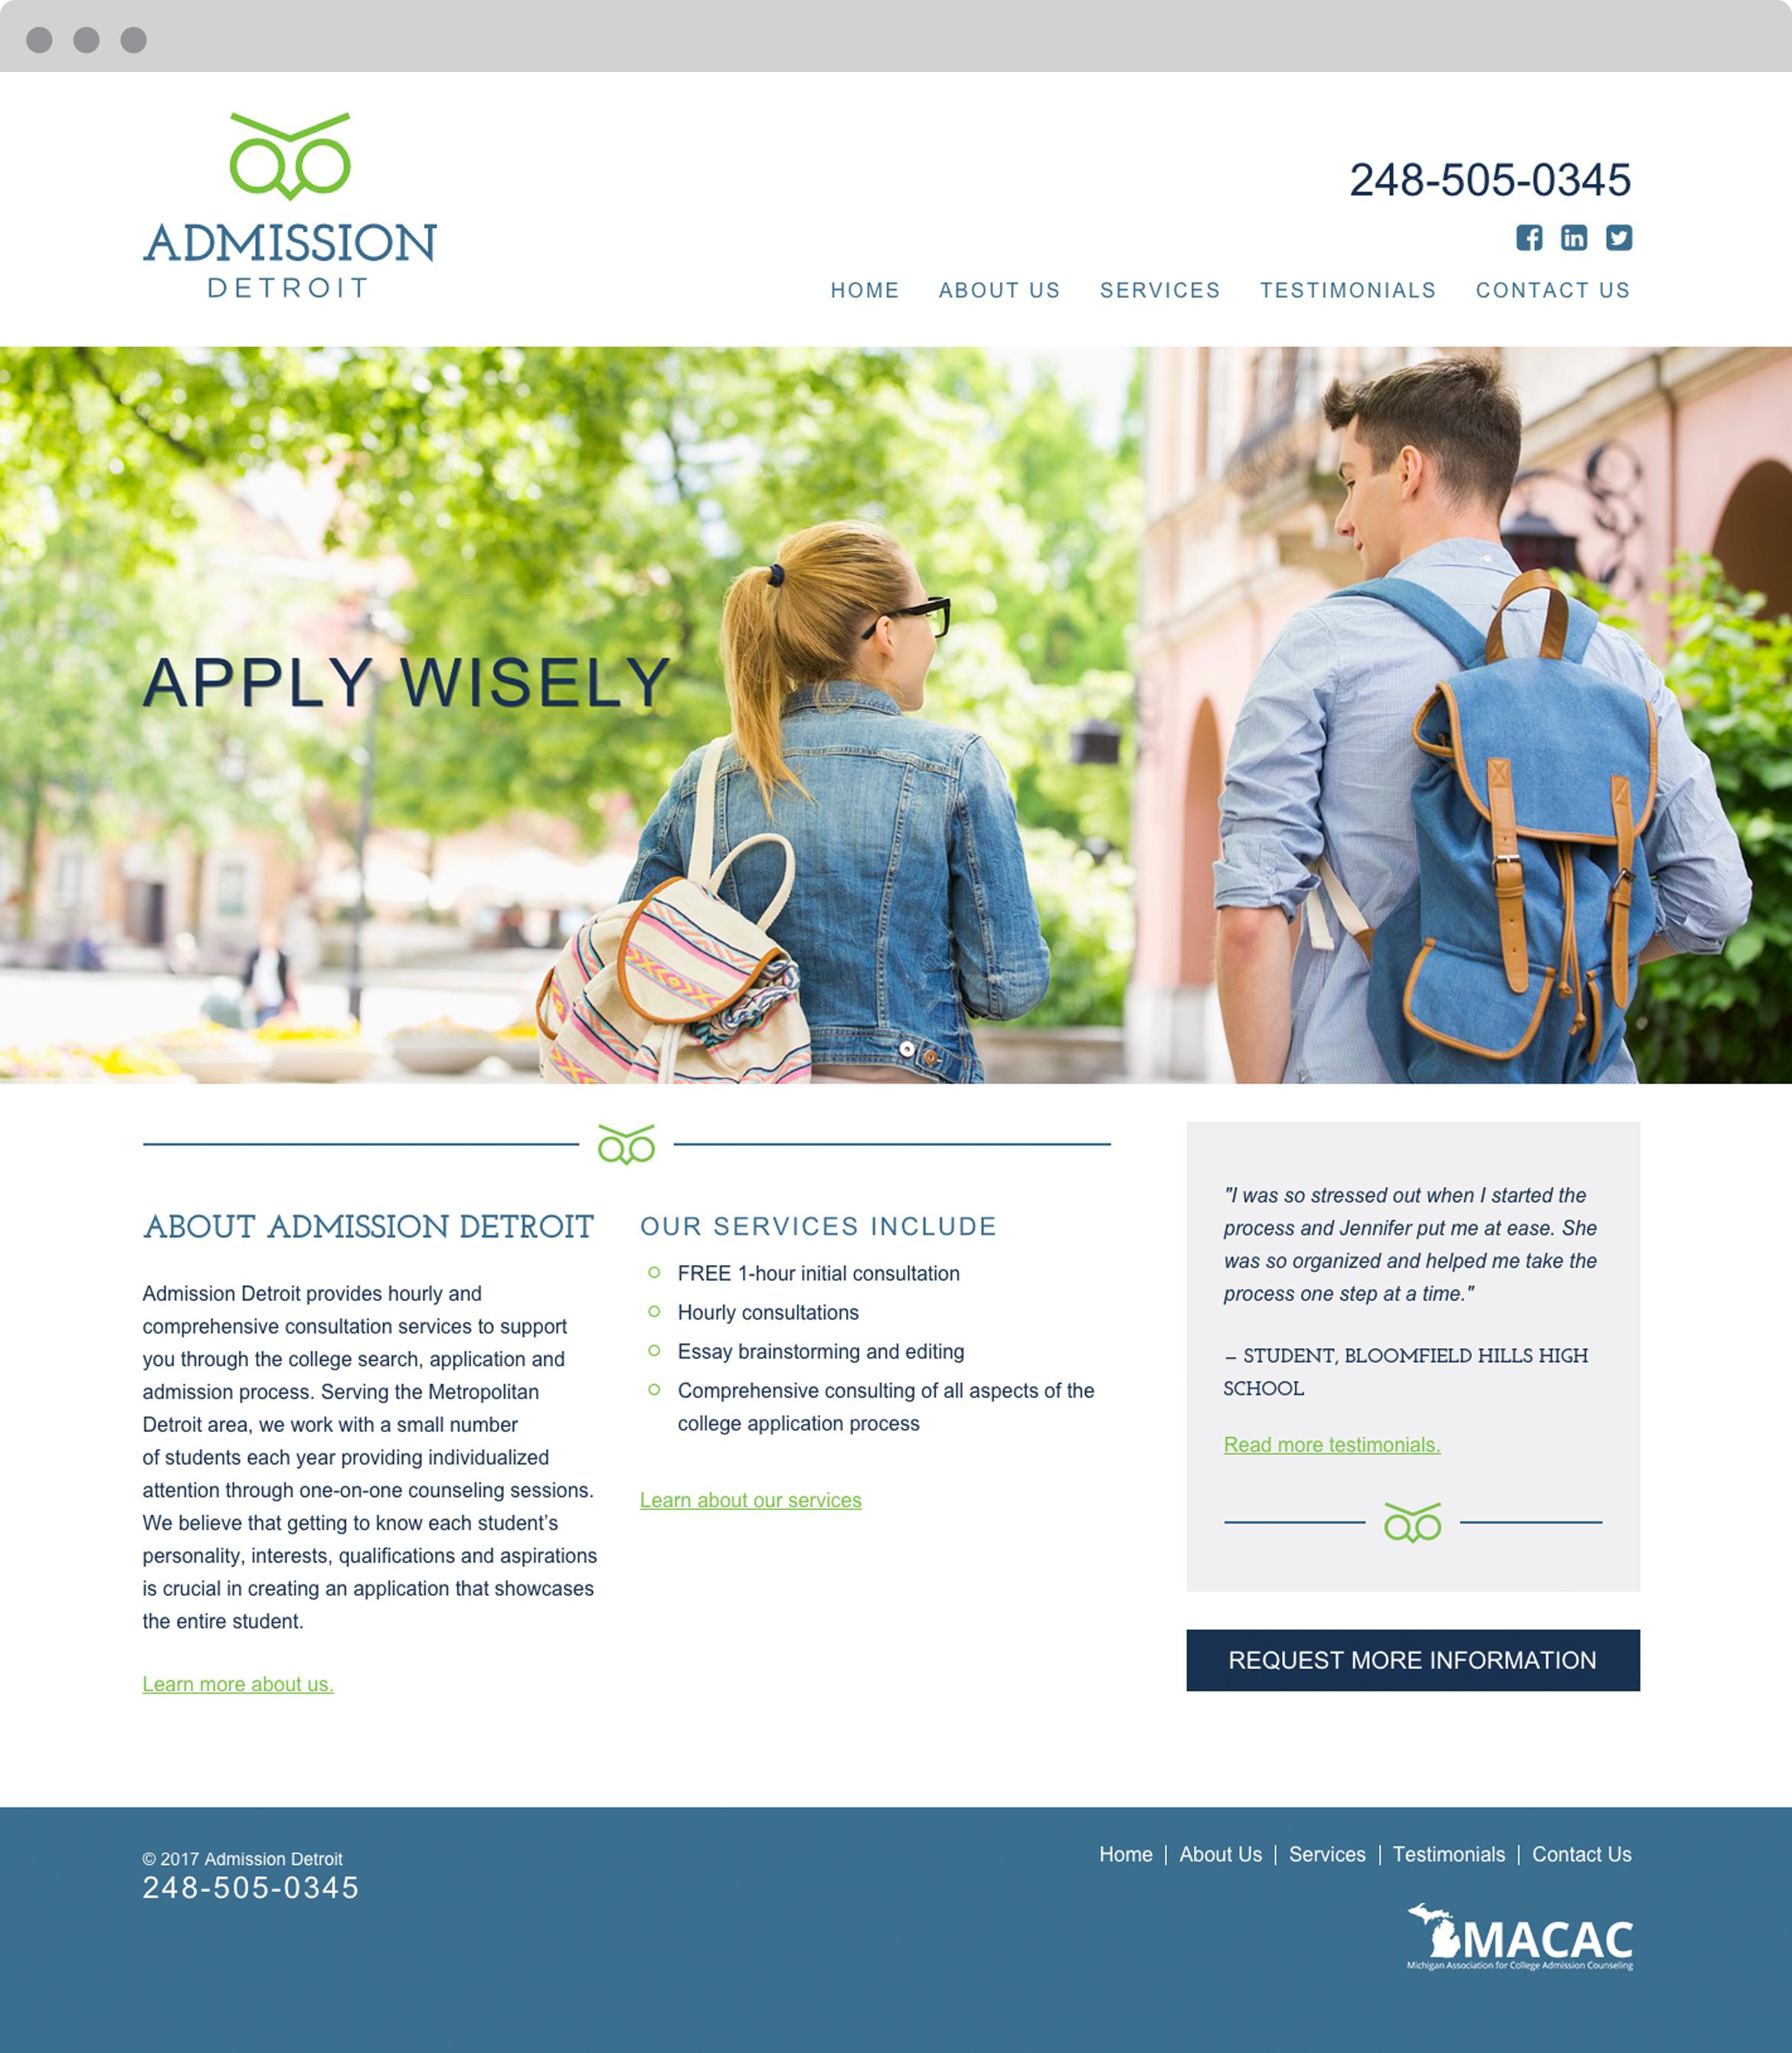 Admission Detroit Mobile Friendly Responsive Website